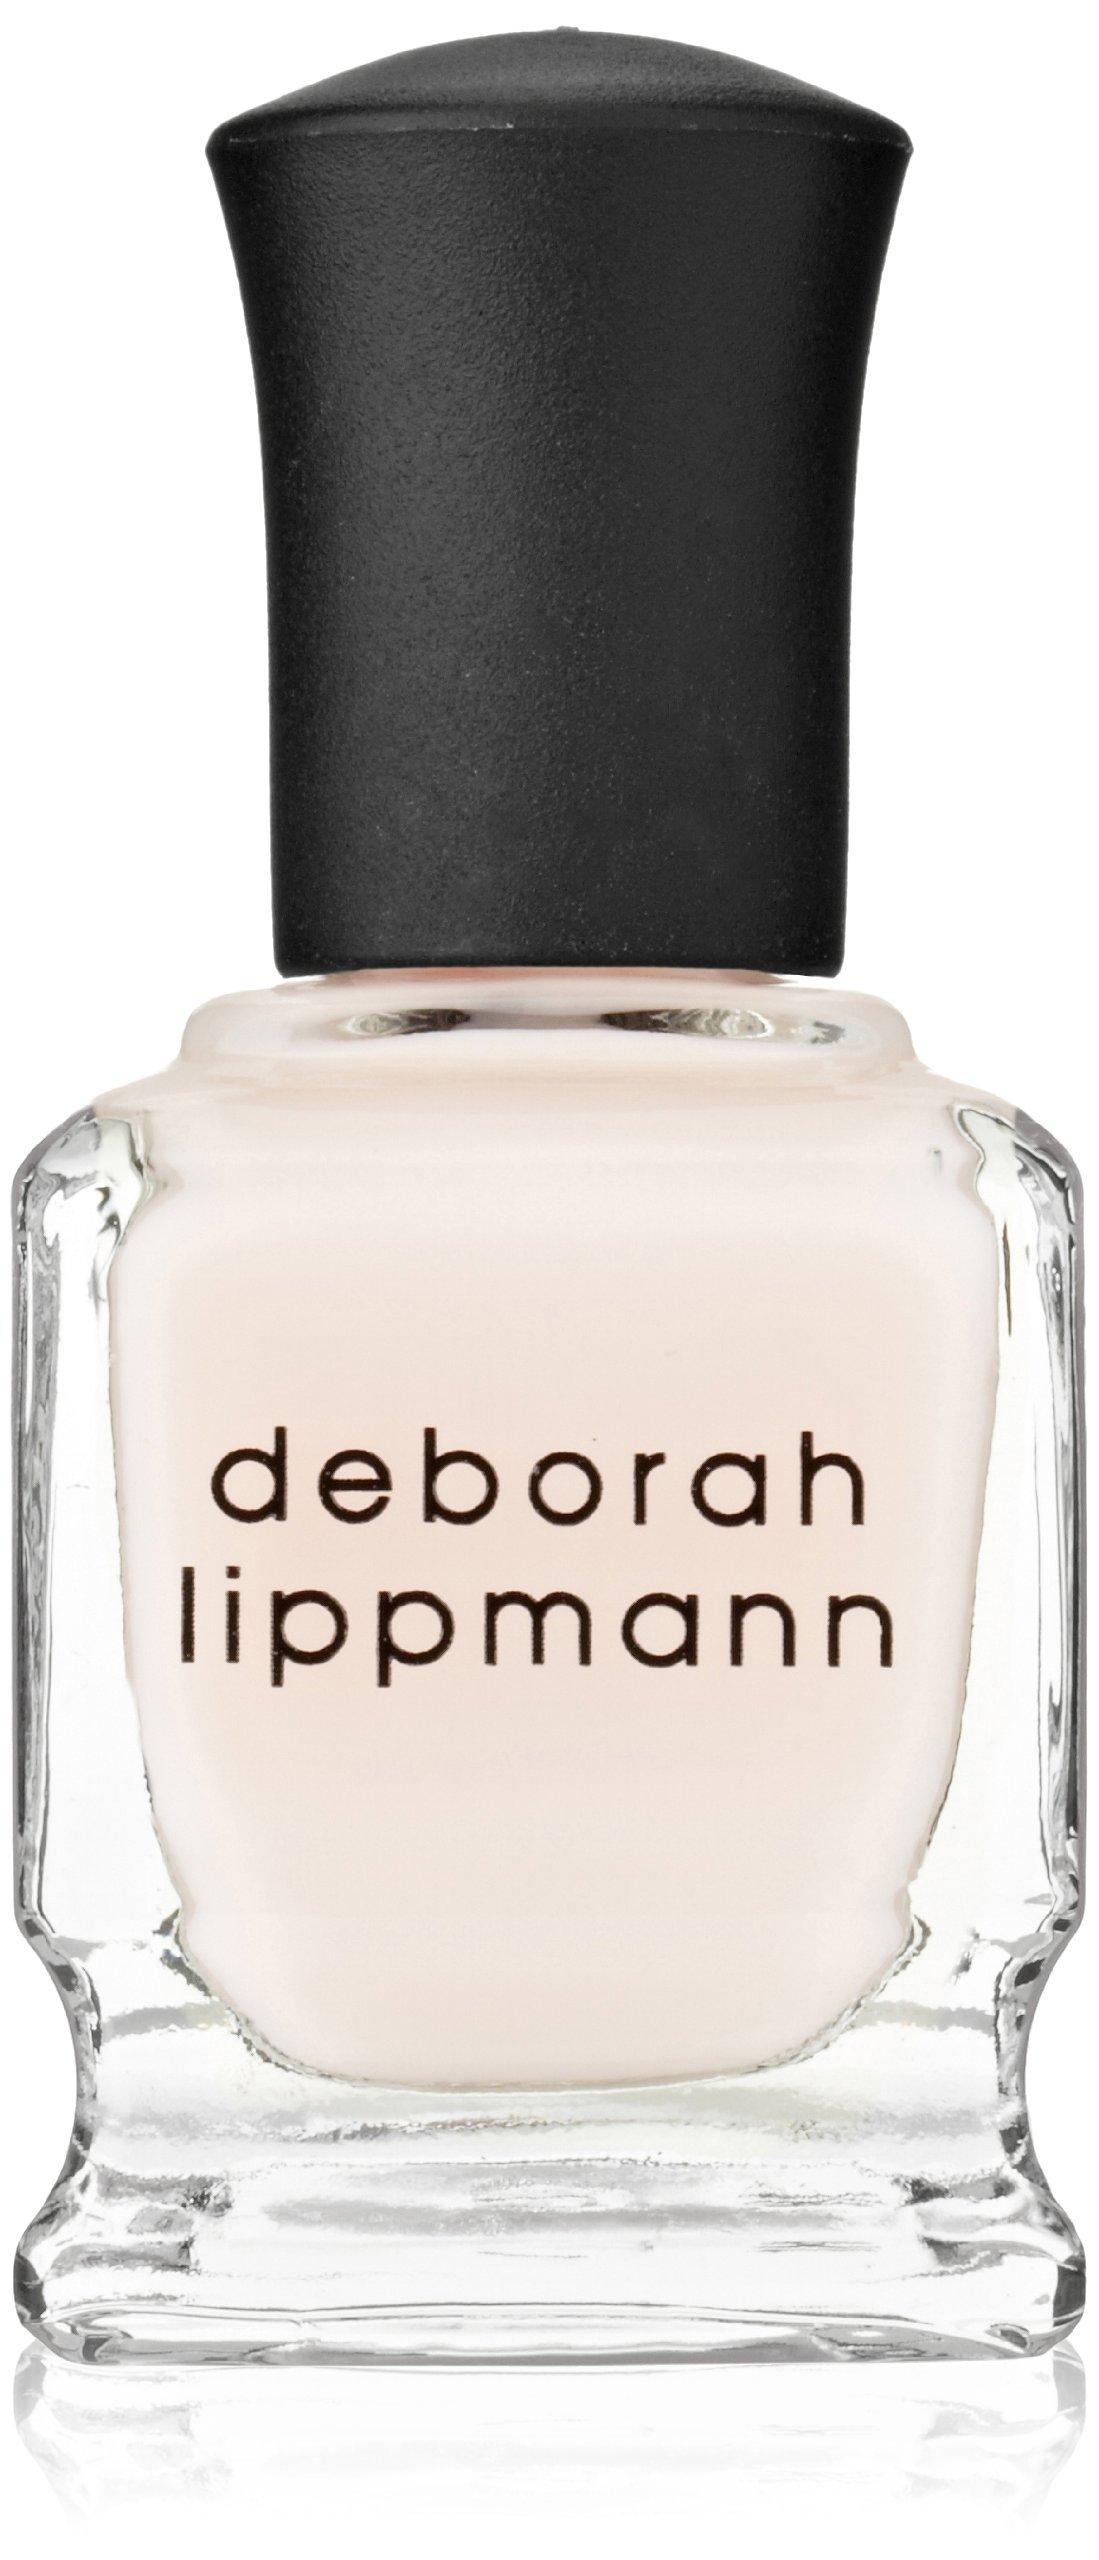 Amazon.com : deborah lippmann Gel Lab System : Nail Polish : Beauty